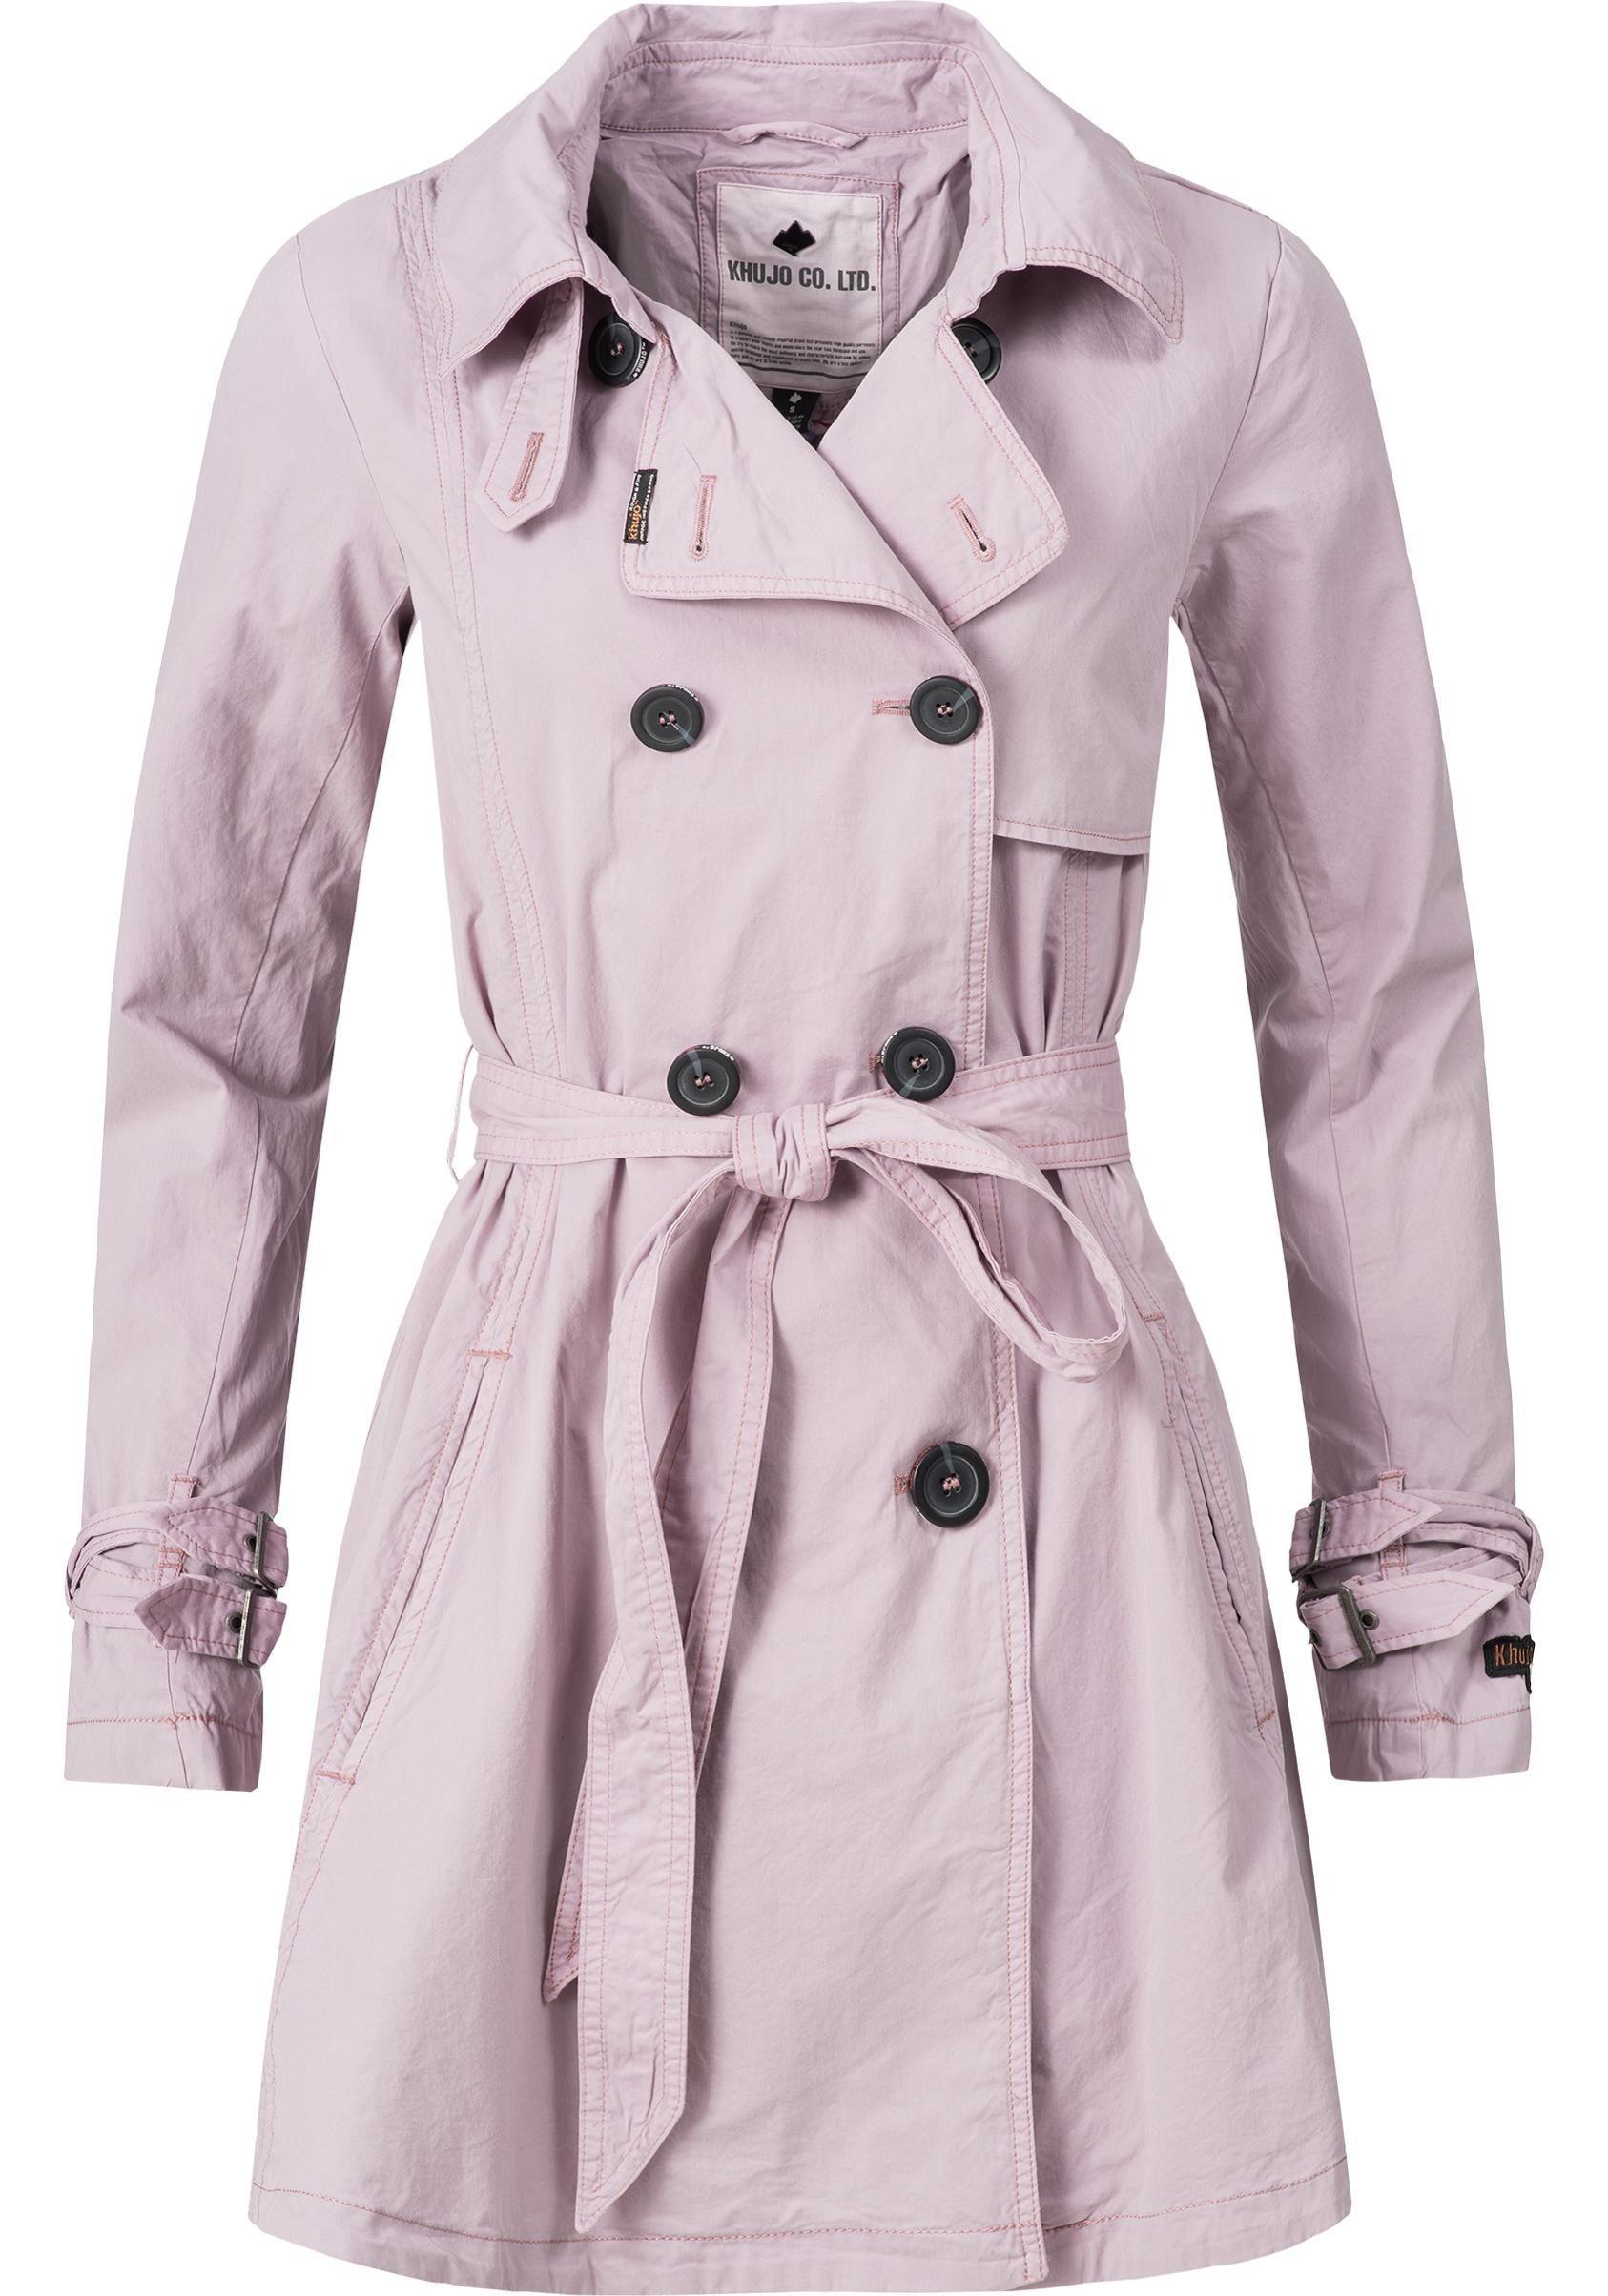 khujo Trenchcoat »YM-Merita«, stylischer Übergangsmantel mit edler zweireihigen Knopfleiste   Bekleidung > Mäntel > Trenchcoats   khujo